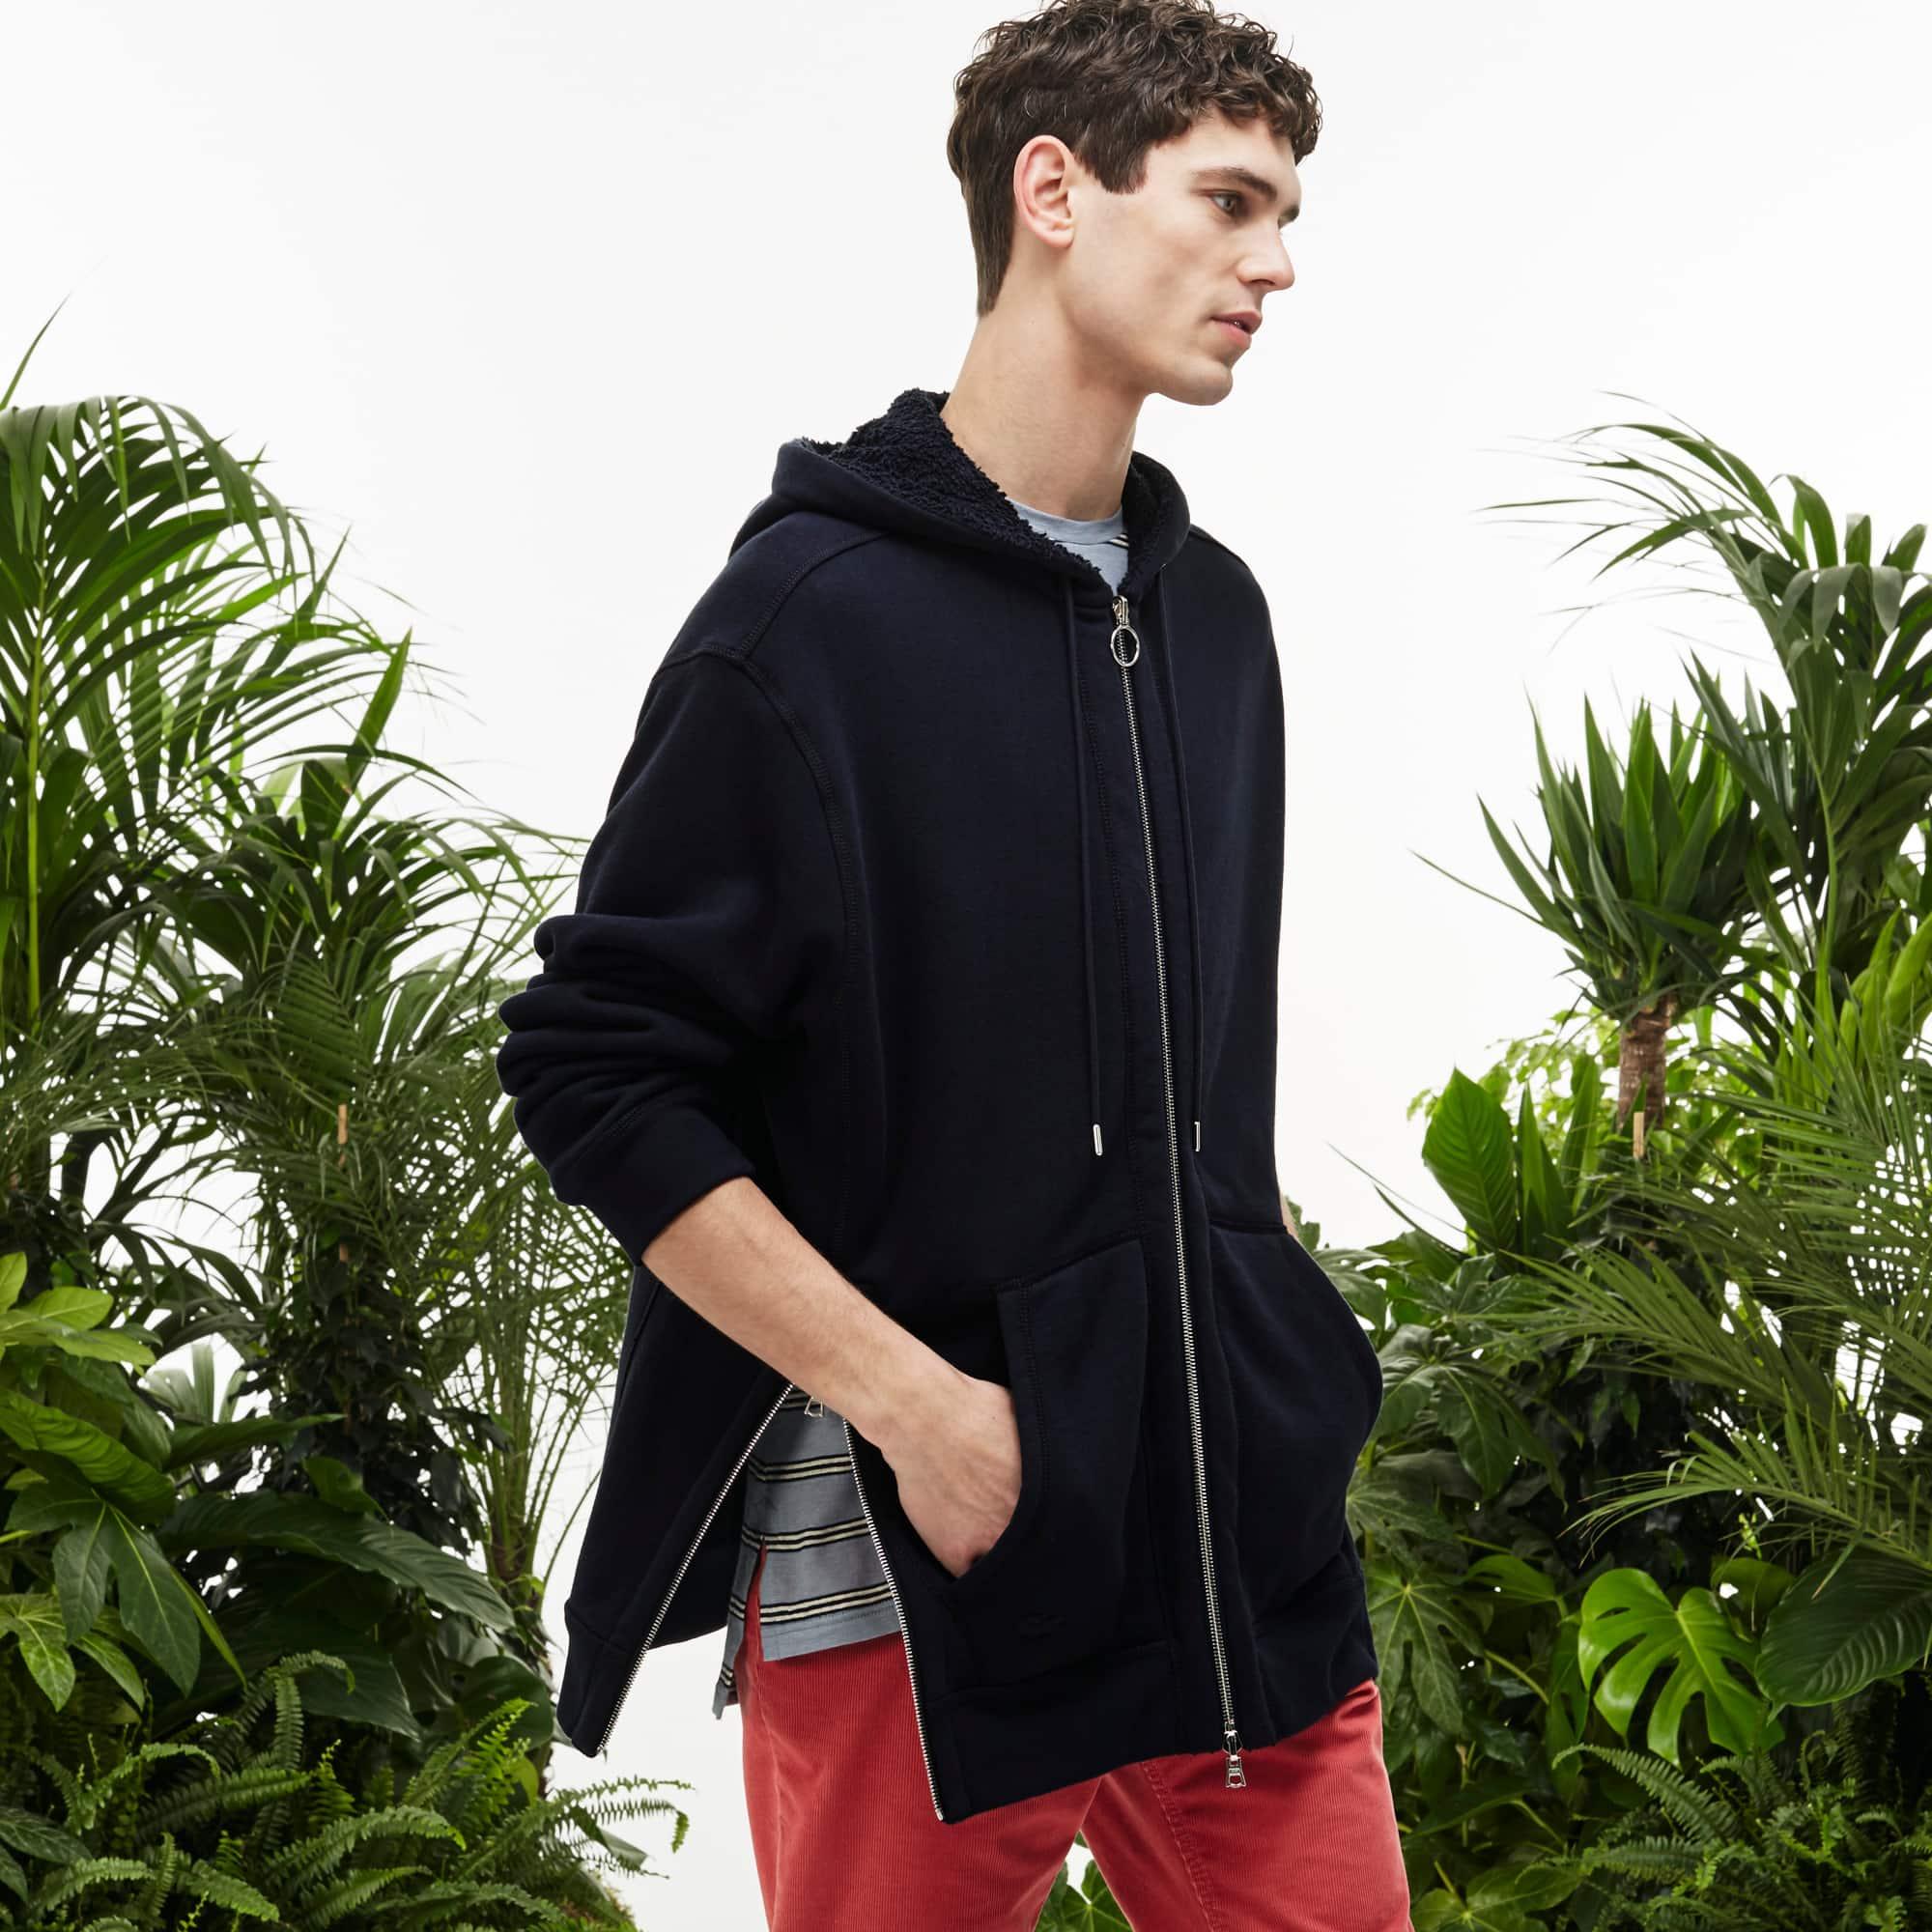 Men's Fashion Show Fleece Reversible Hooded Zippered Sweatshirt